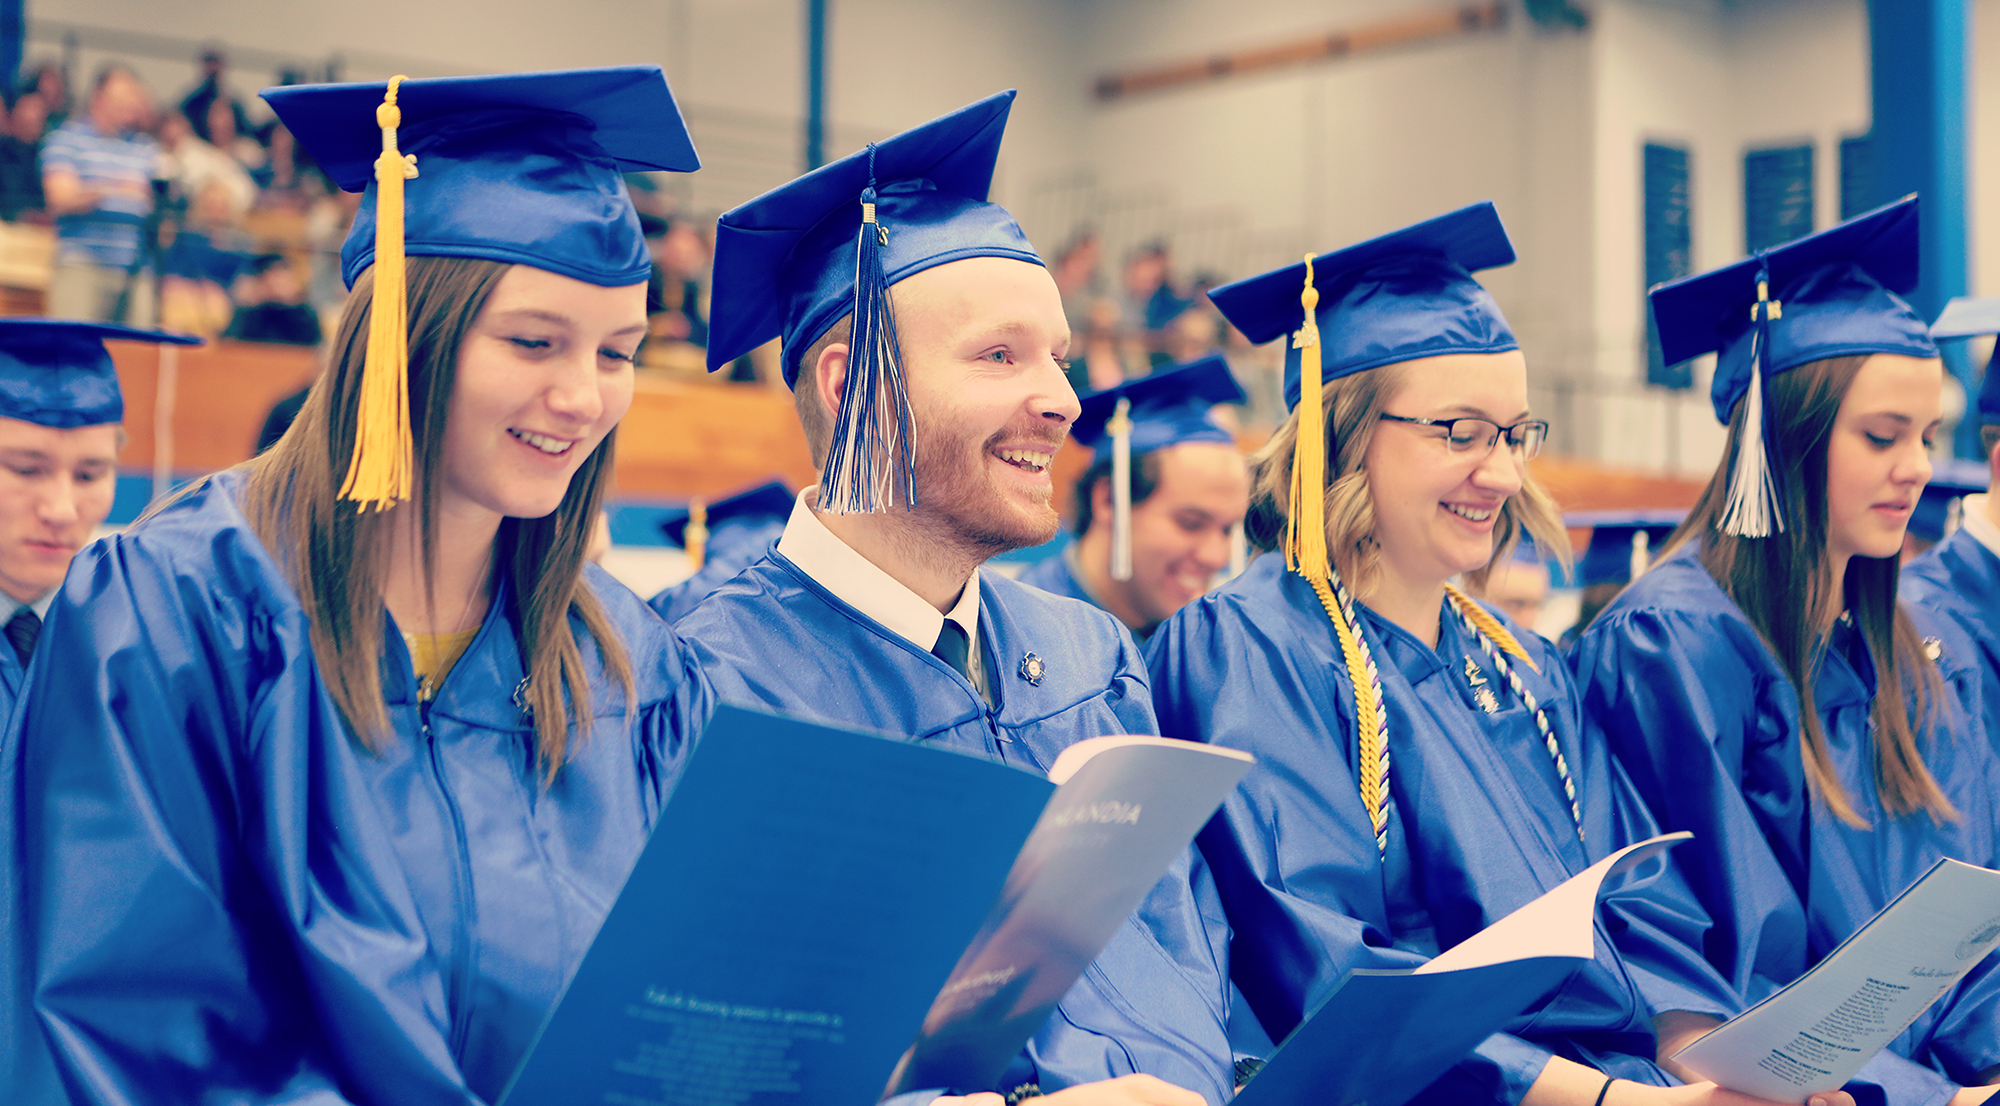 Graduation Day 2020.Graduation Day 2019 Finlandia University Finlandia